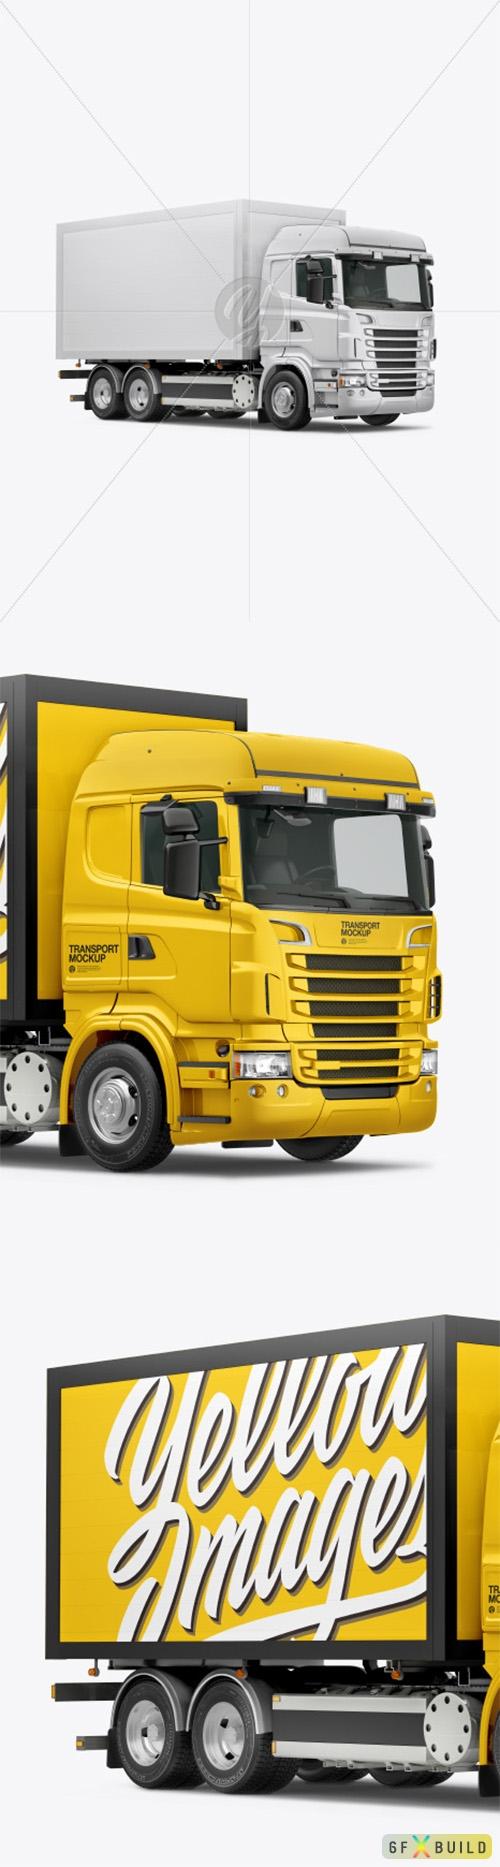 Truck Mockup - Half Side View 47175 TIF